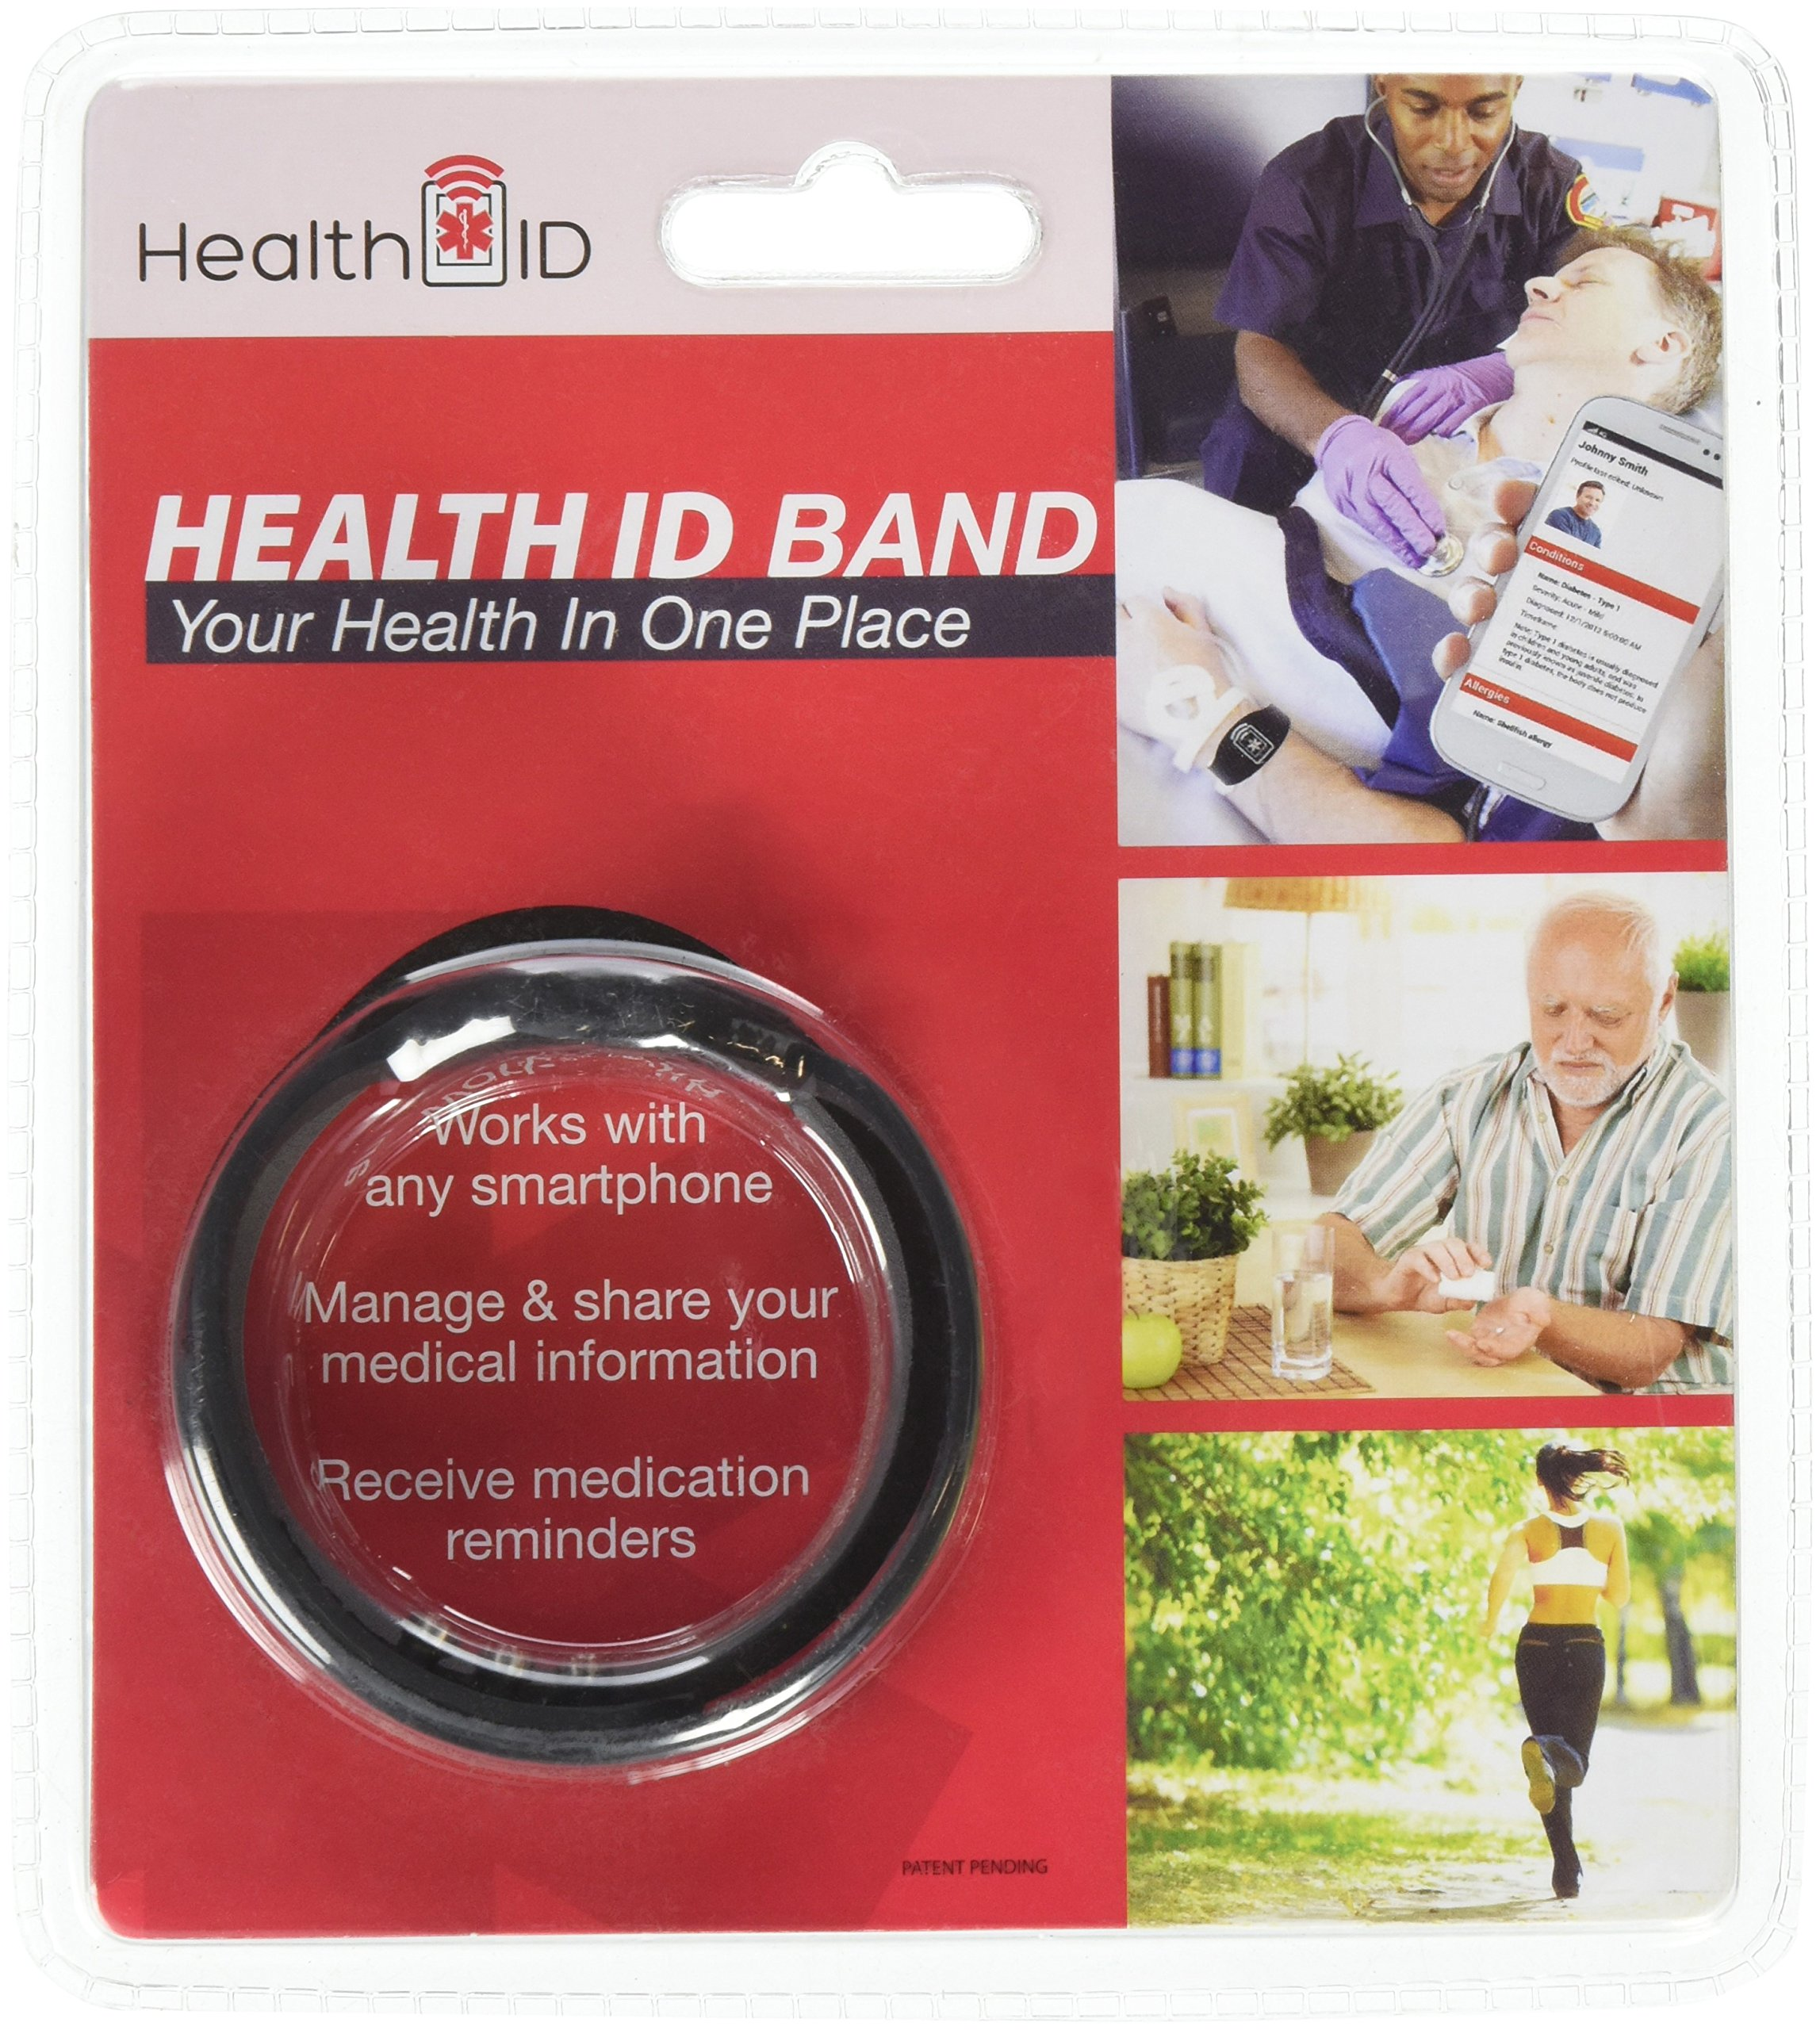 Health ID Emergency Medical ID Bracelet with Smartphone Access - Black